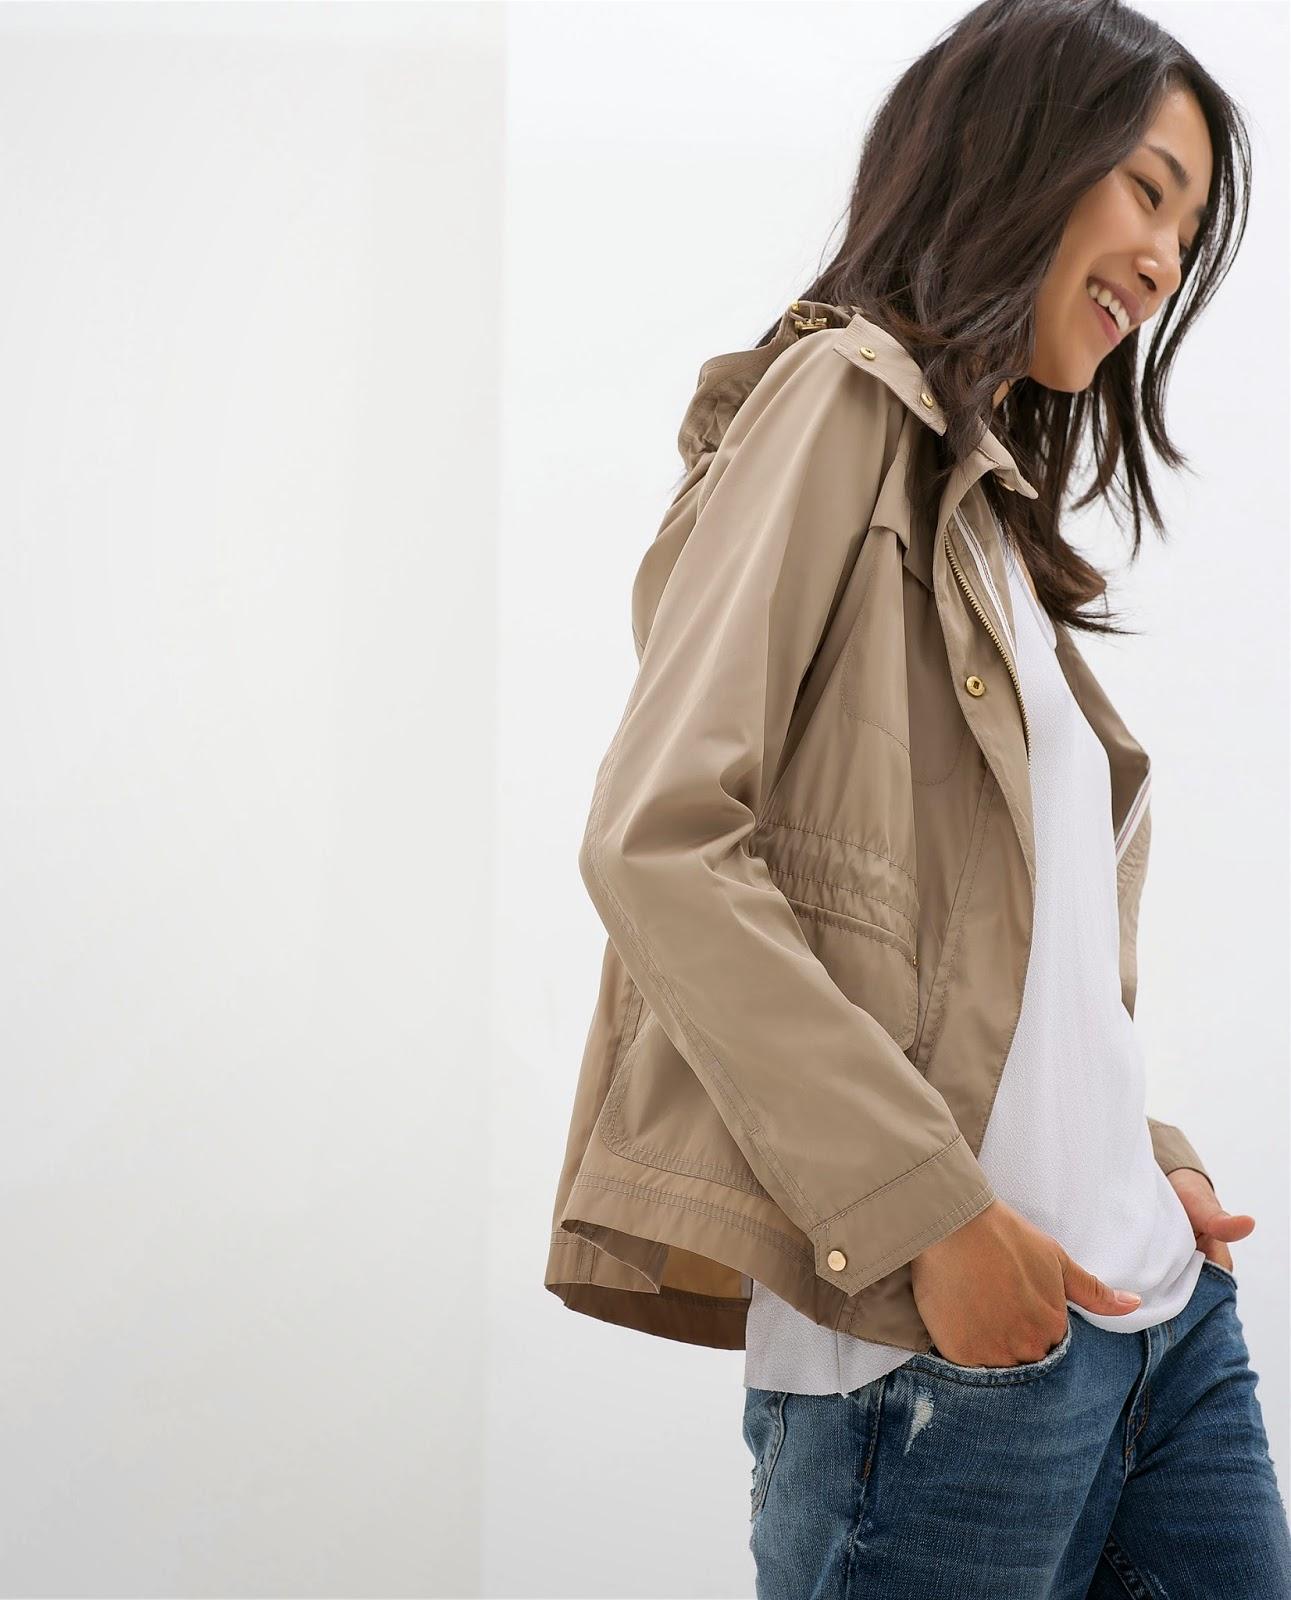 Sahariana, t-shirt, jeans, Zara, moda, style, Fashion style